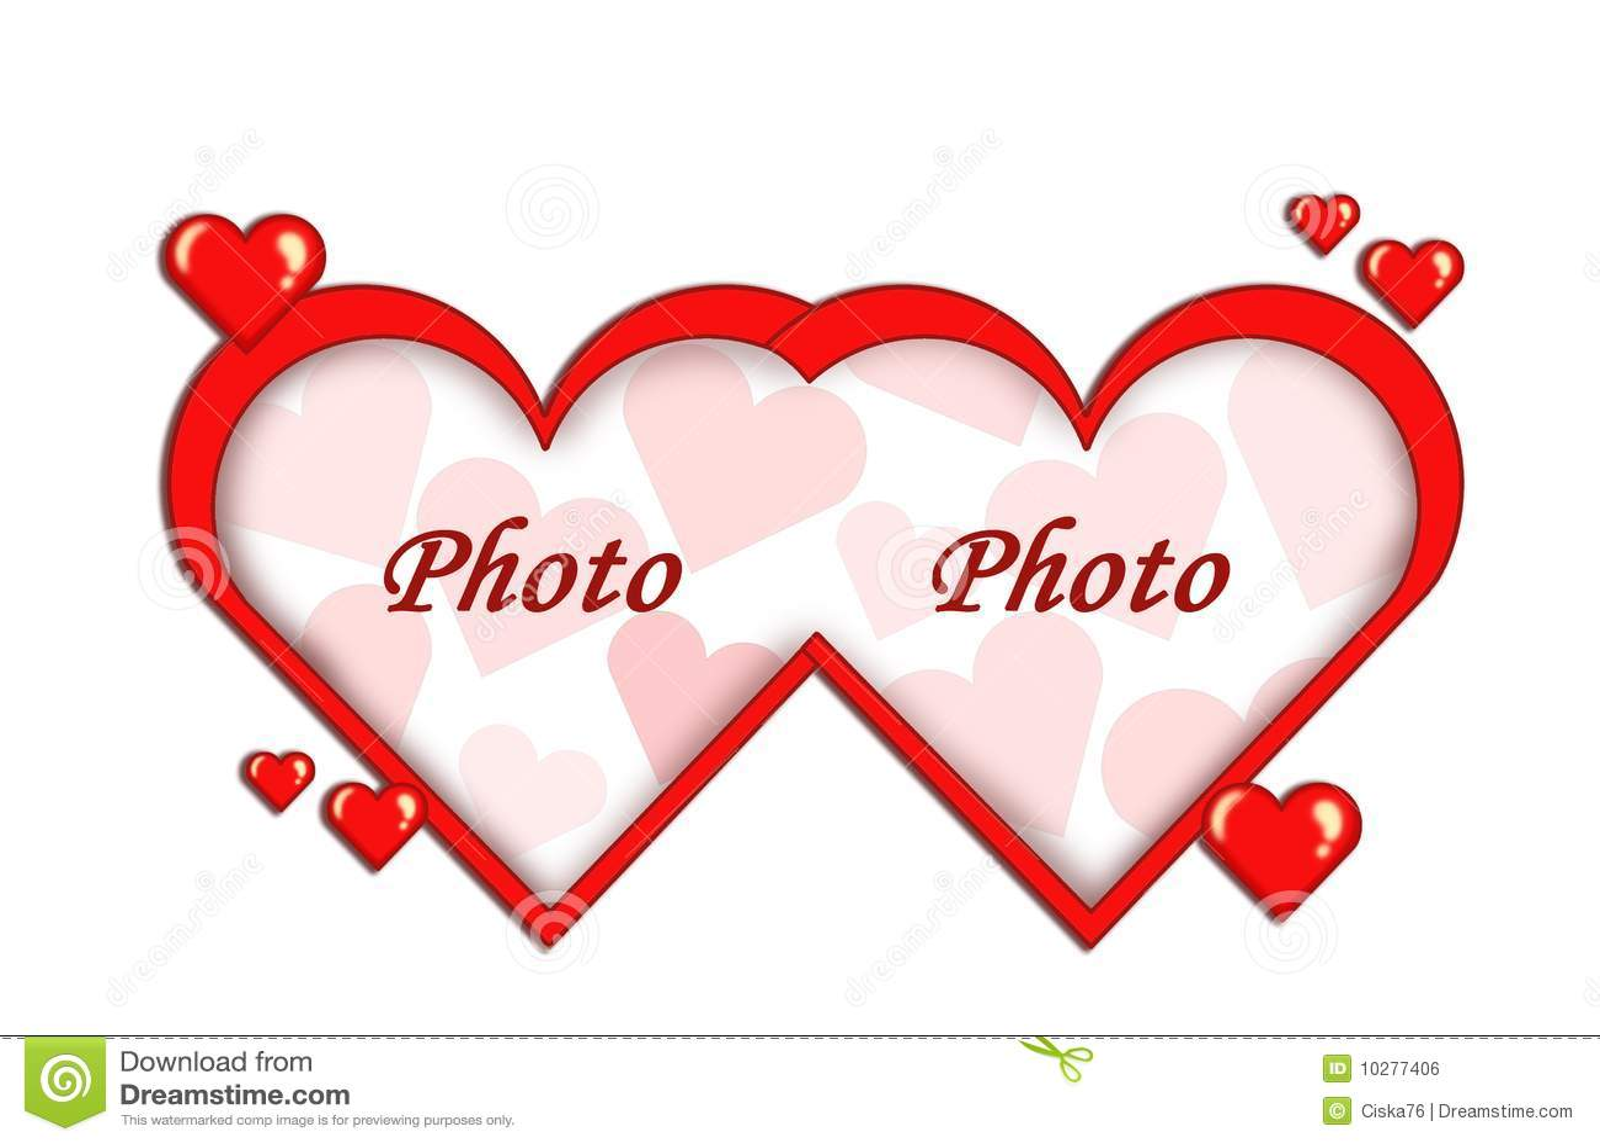 Frame, love stock illustration. Illustration of valentine - 10277406